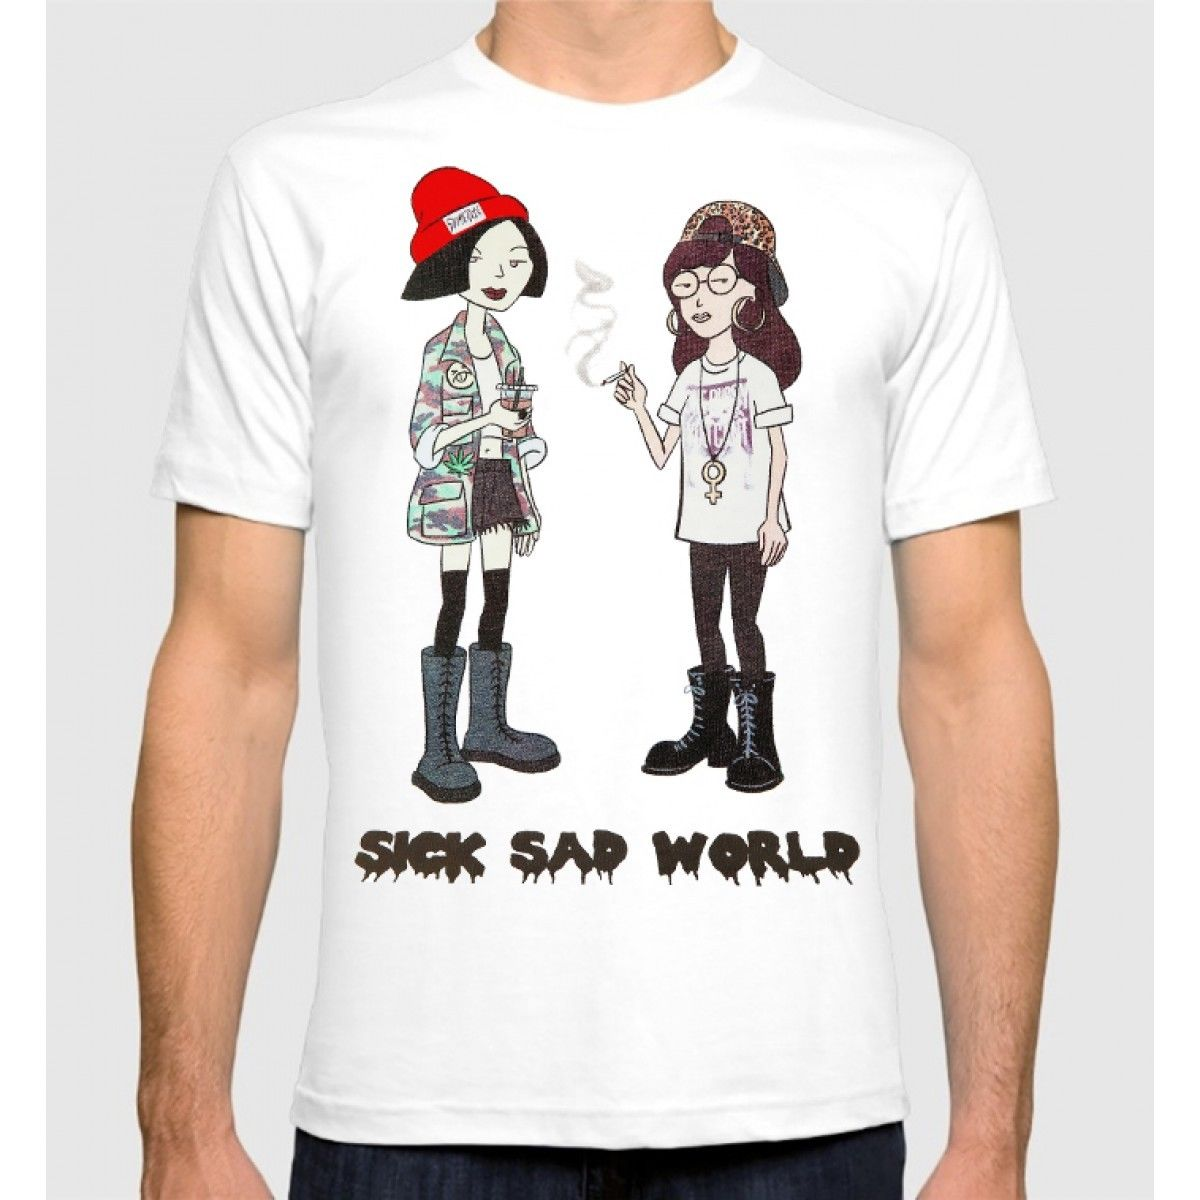 Daria T-shirt Sick Sad World Men Women New Cotton Tee S-7XL